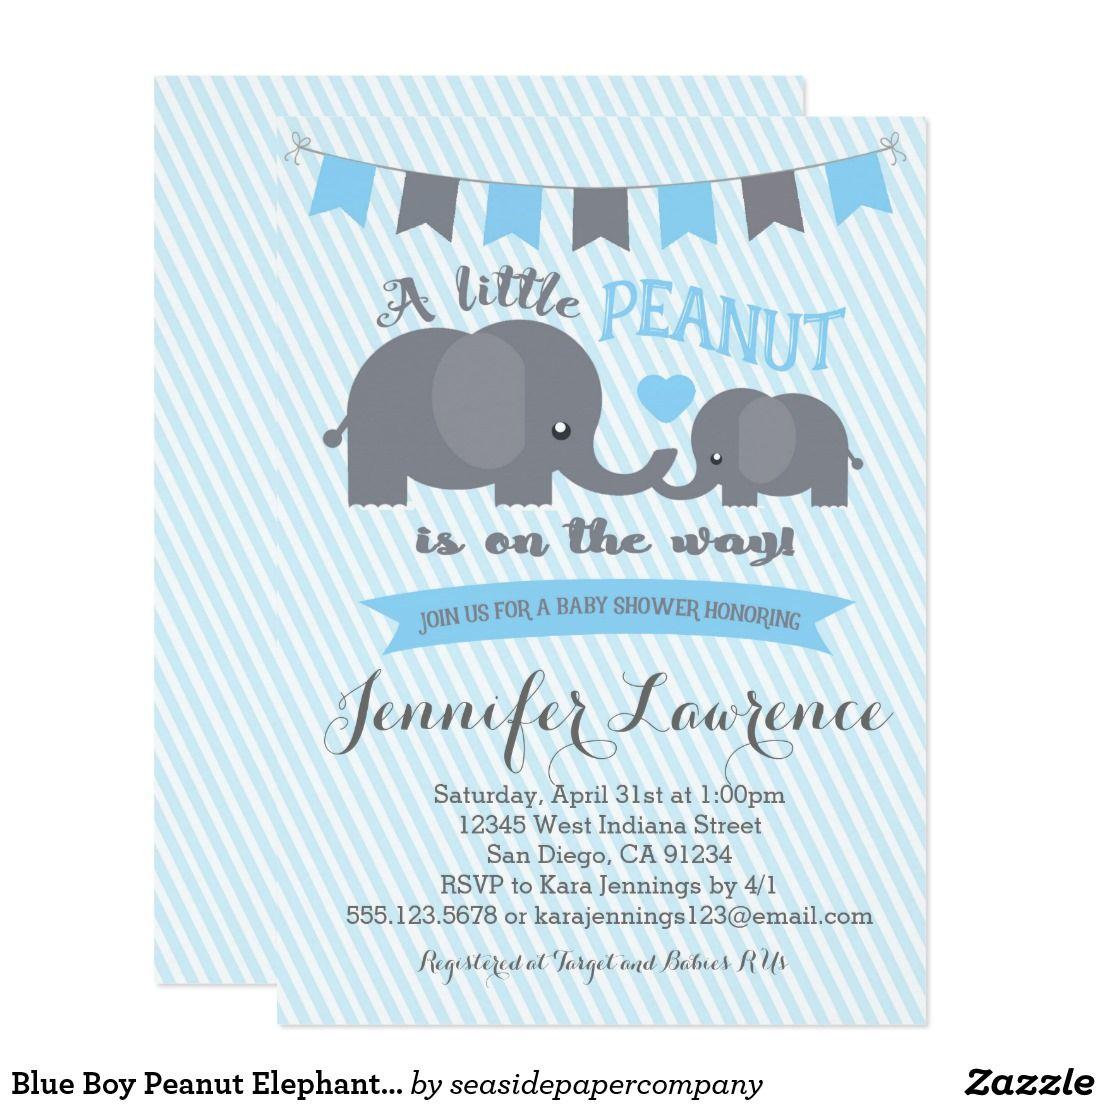 Blue Boy Peanut Elephant Baby Shower invitation | Elephant baby ...